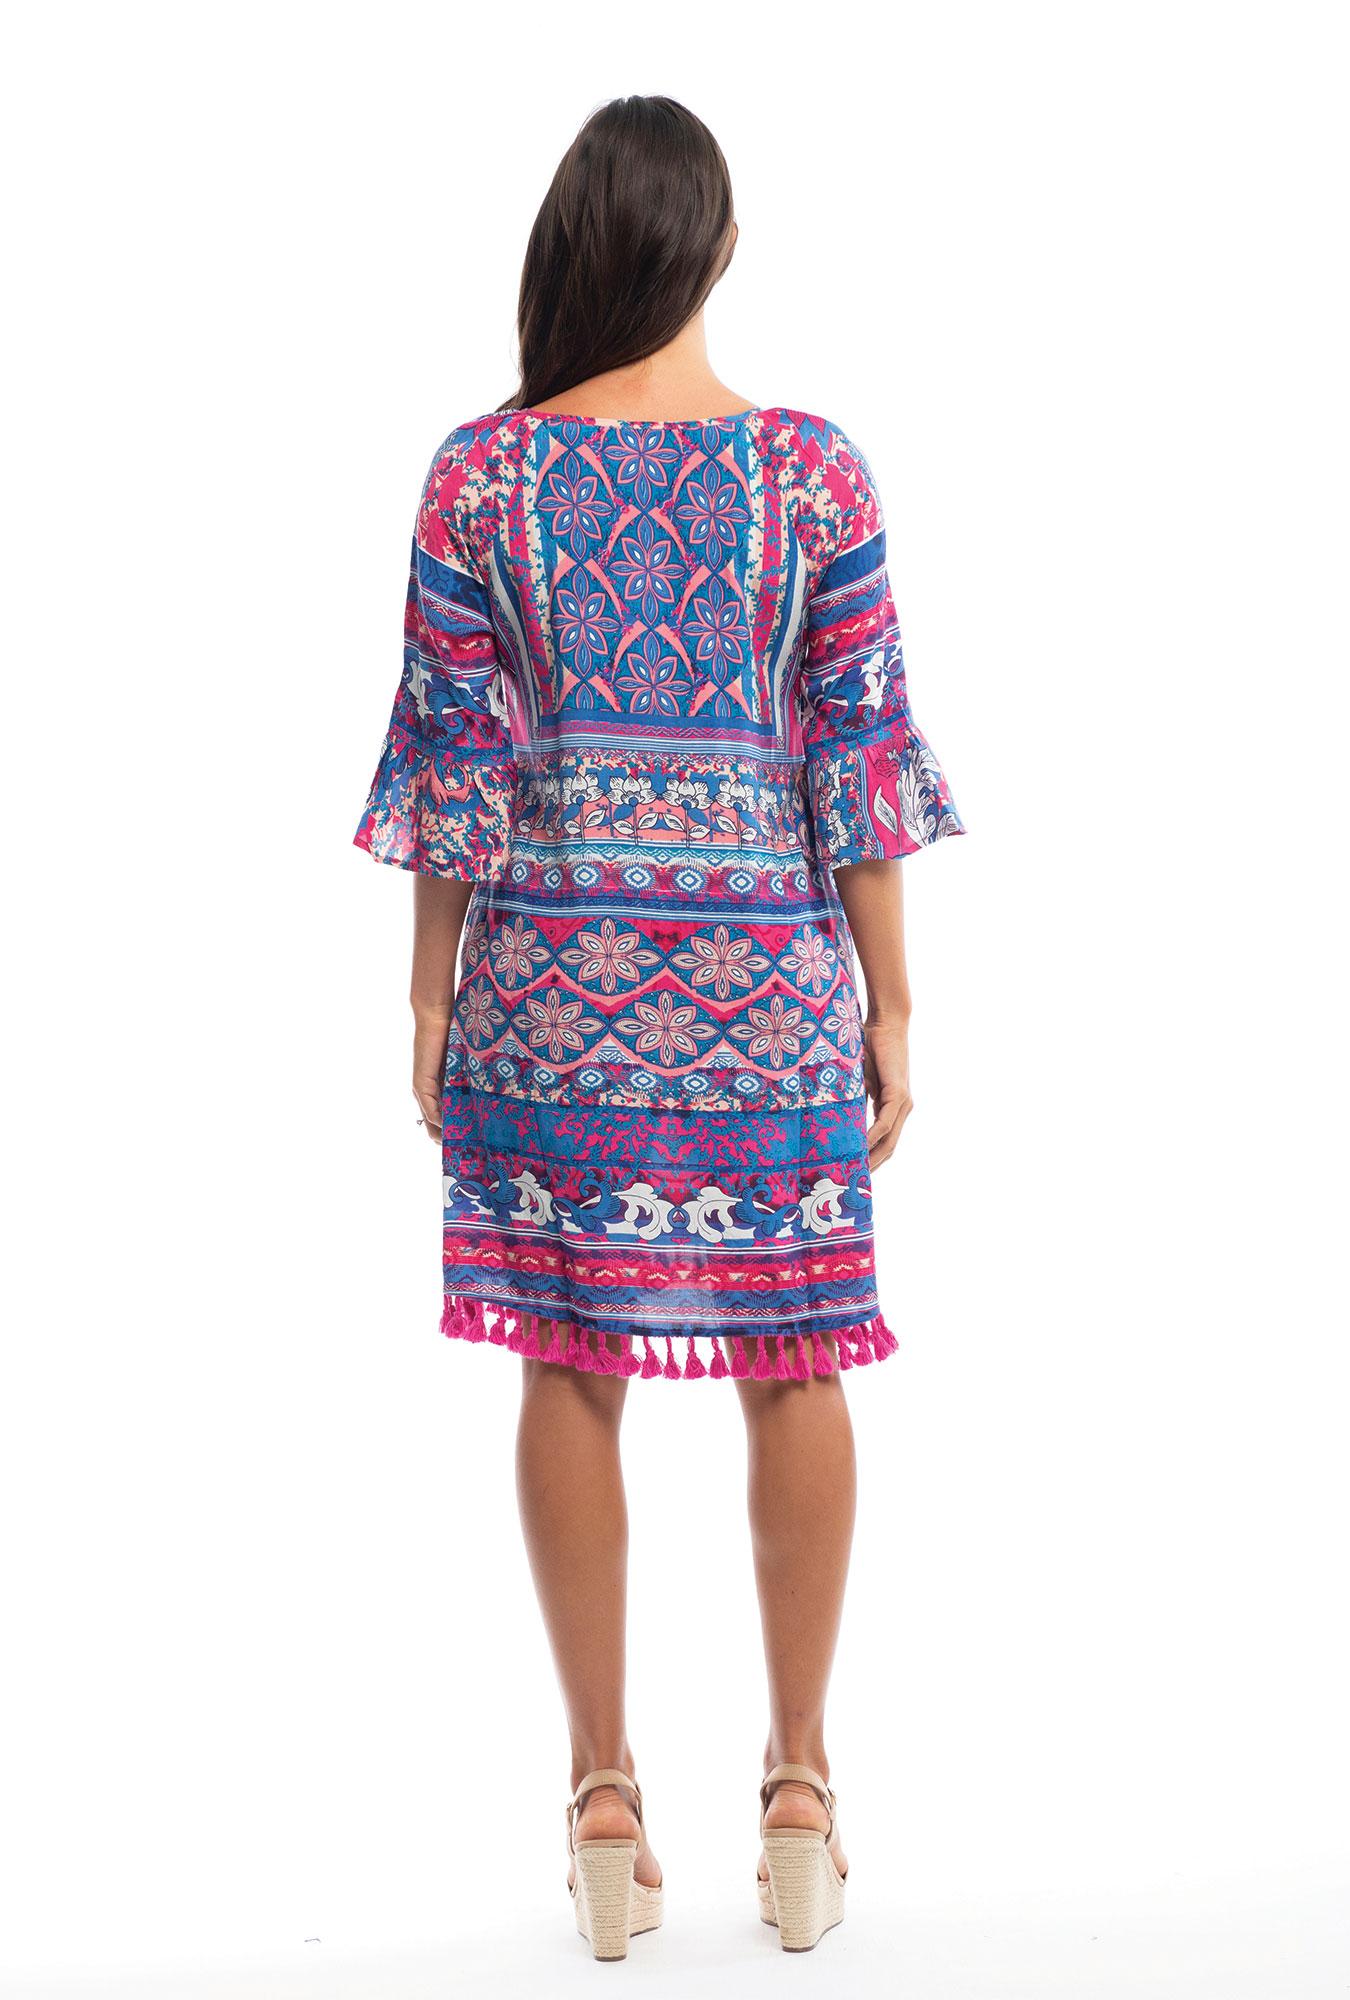 Ari Dress in St Tropez